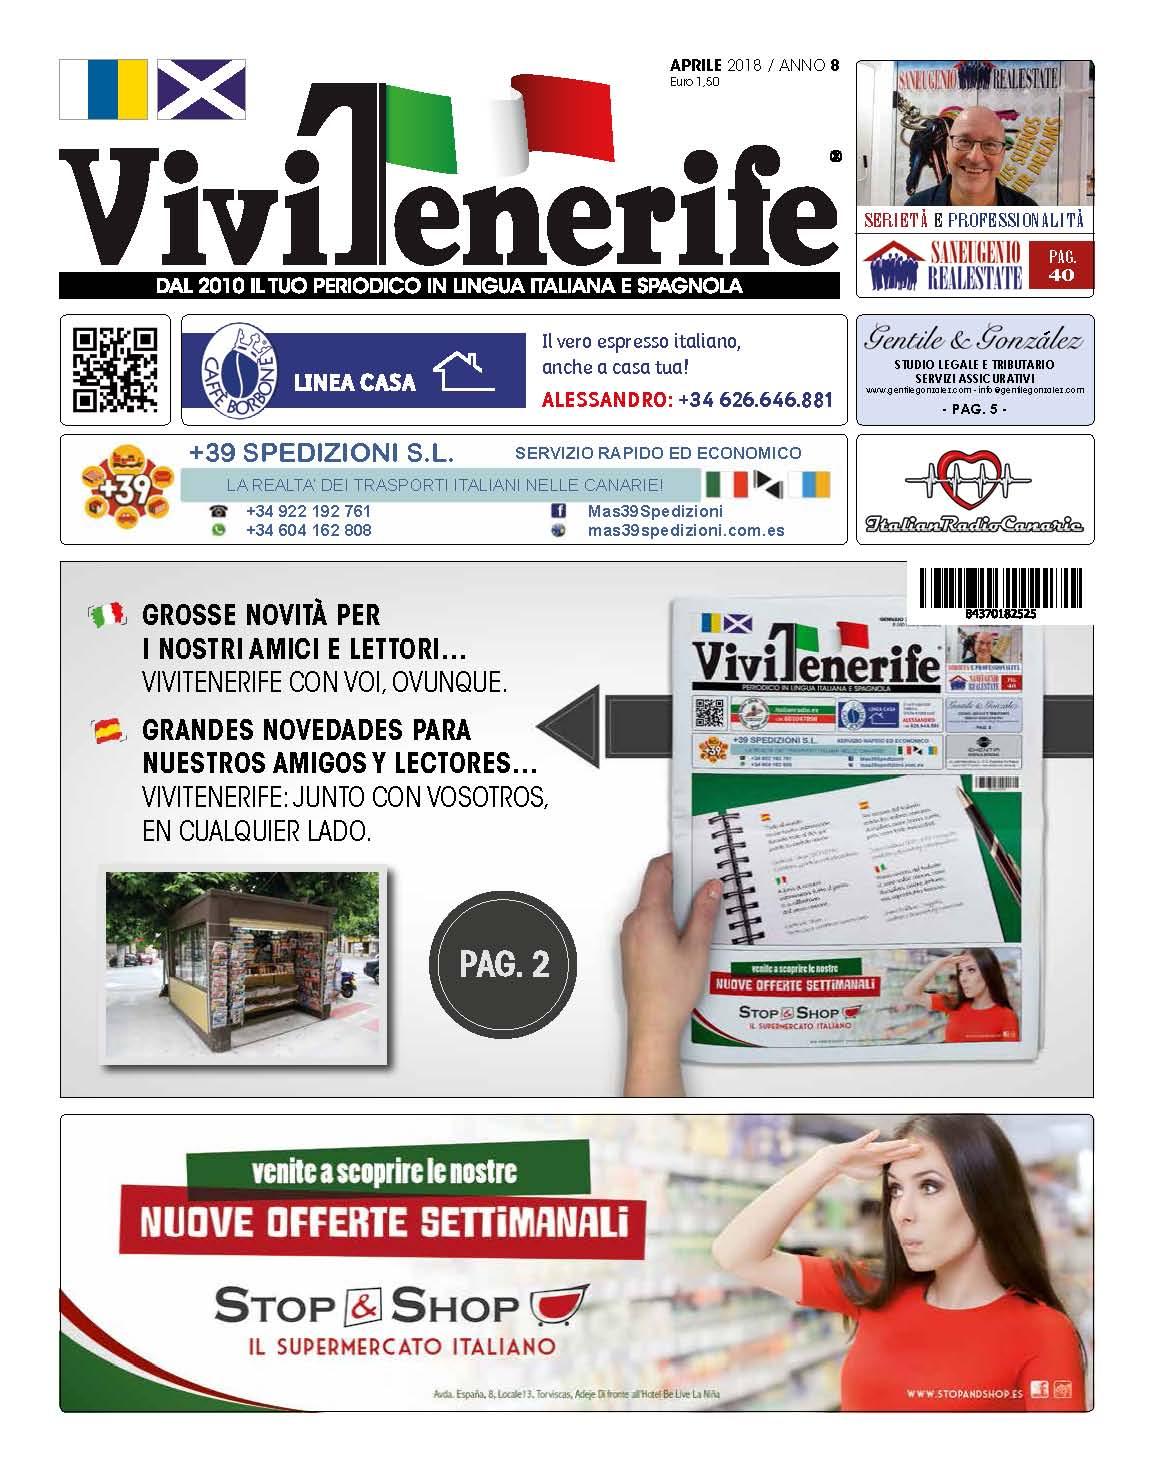 ViviTenerife Aprile 2018